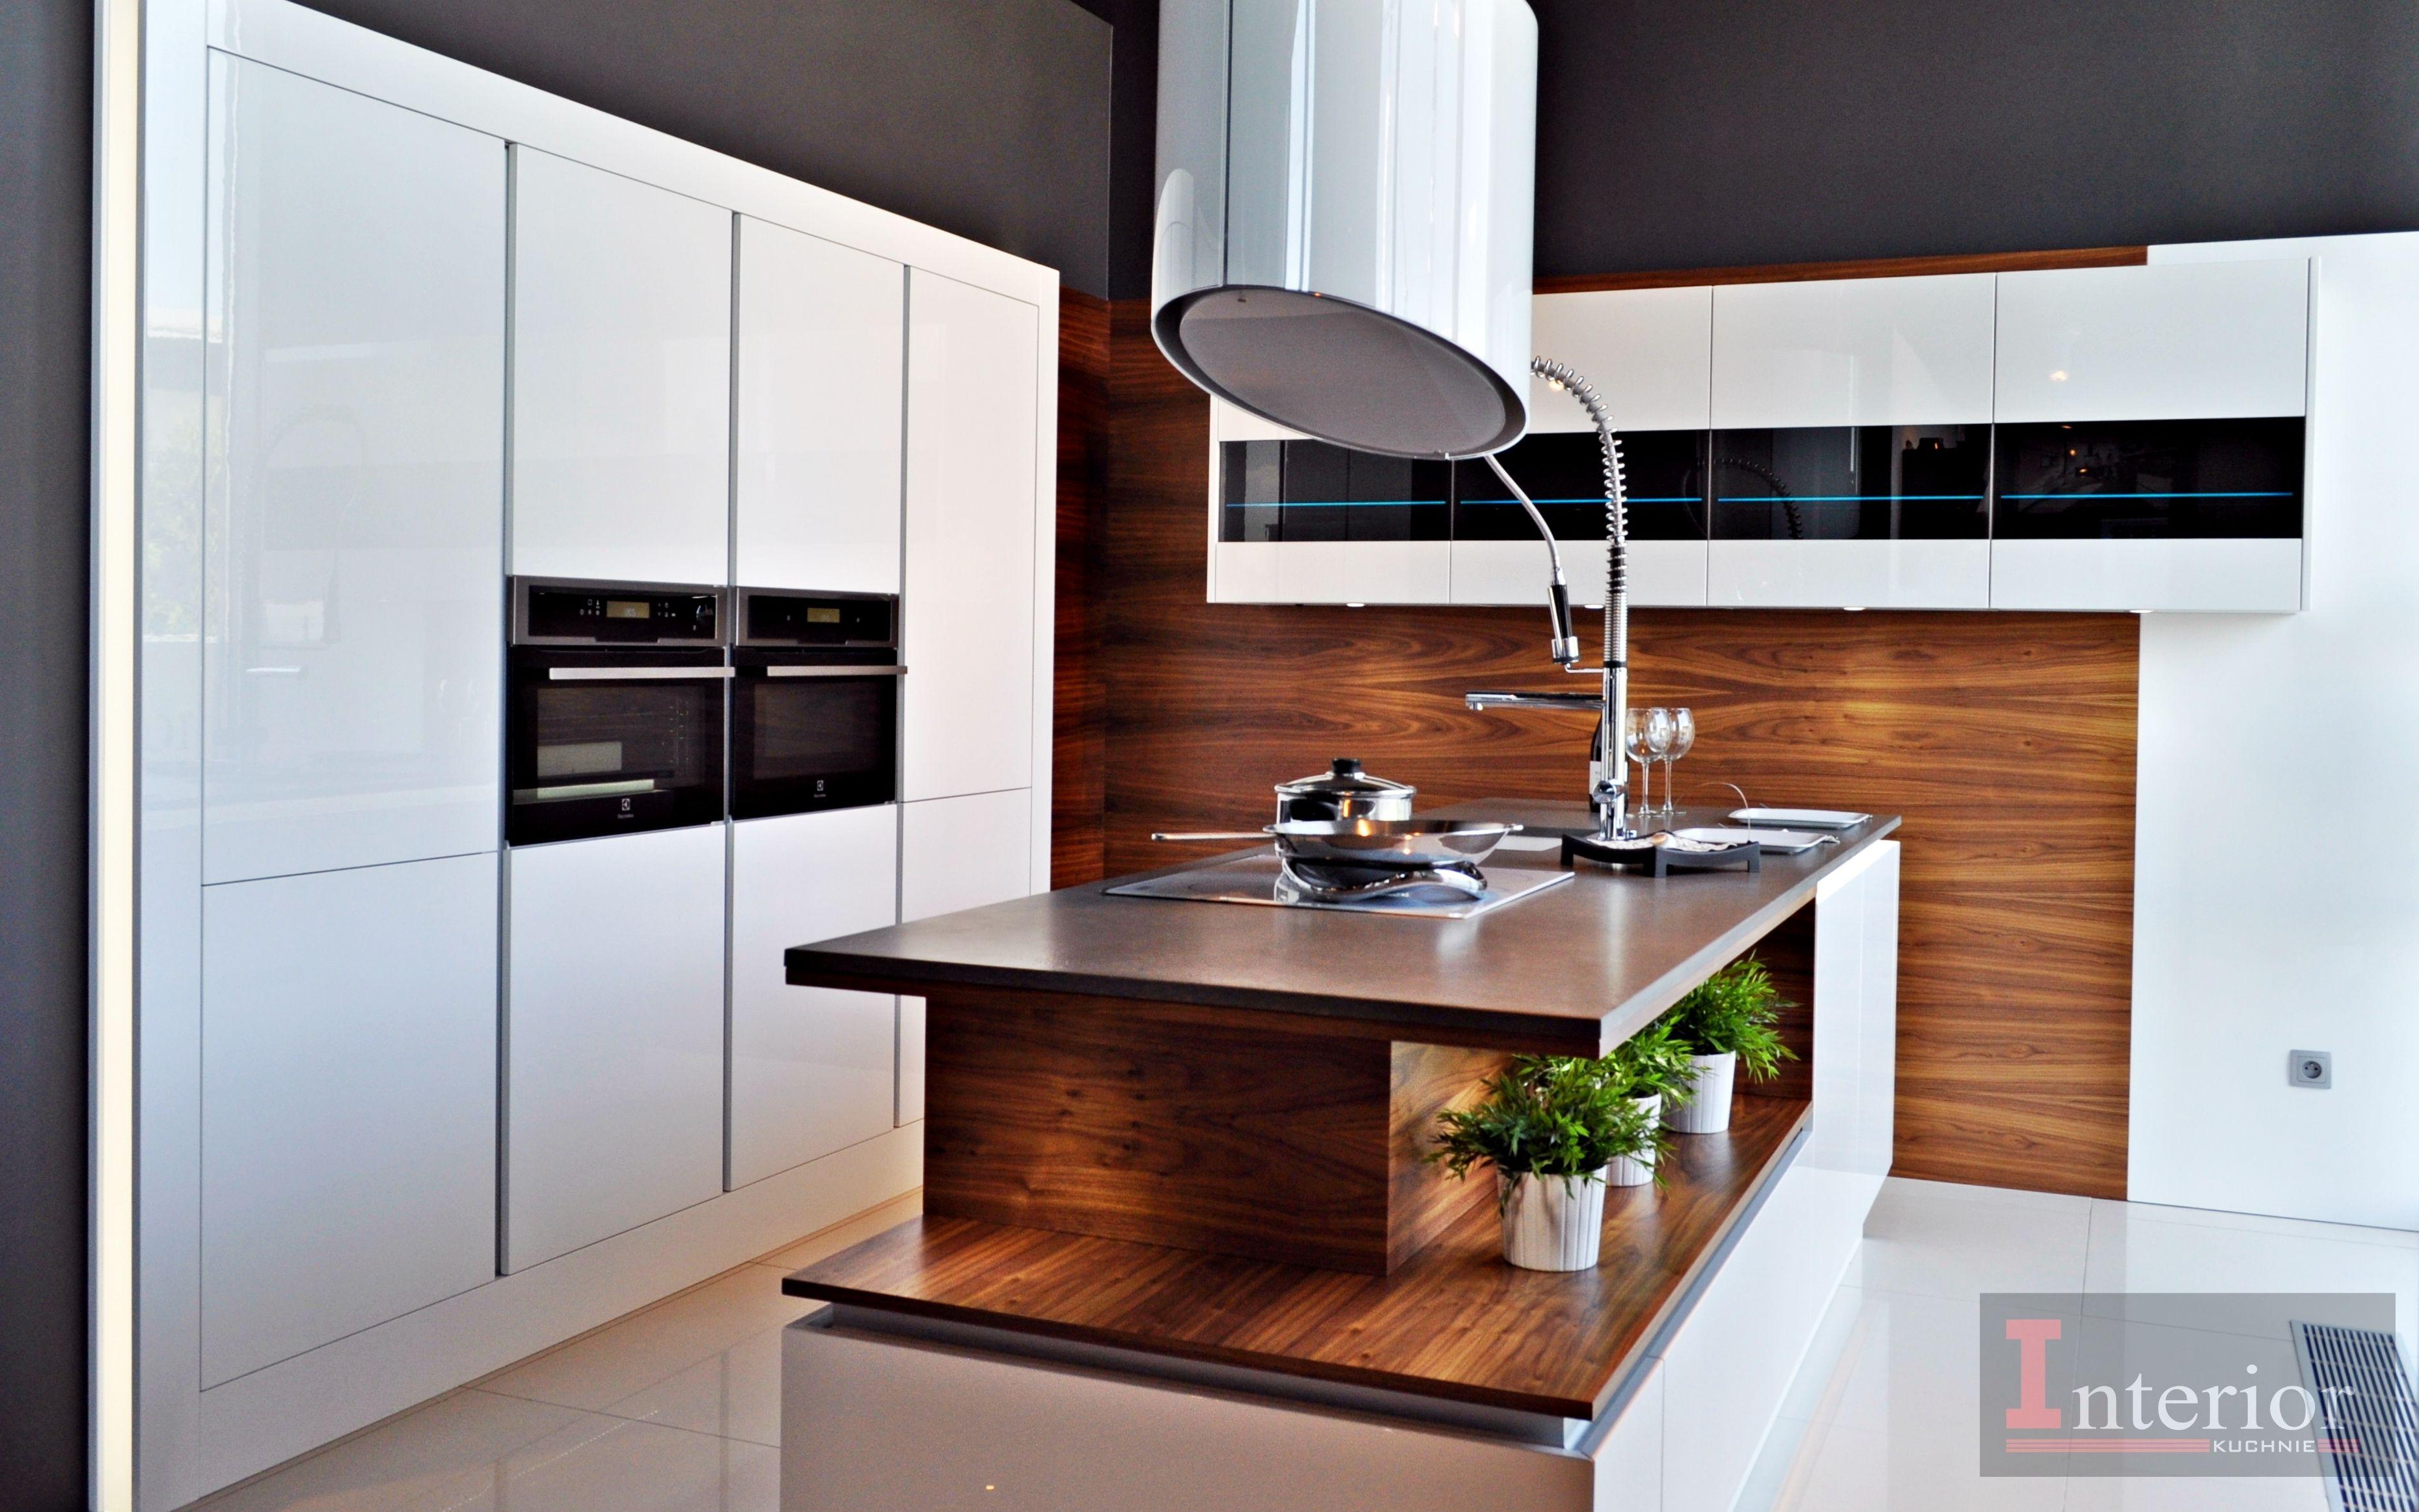 meble kuchenne bia y po ysk orzech ameryka ski interior pinterest. Black Bedroom Furniture Sets. Home Design Ideas